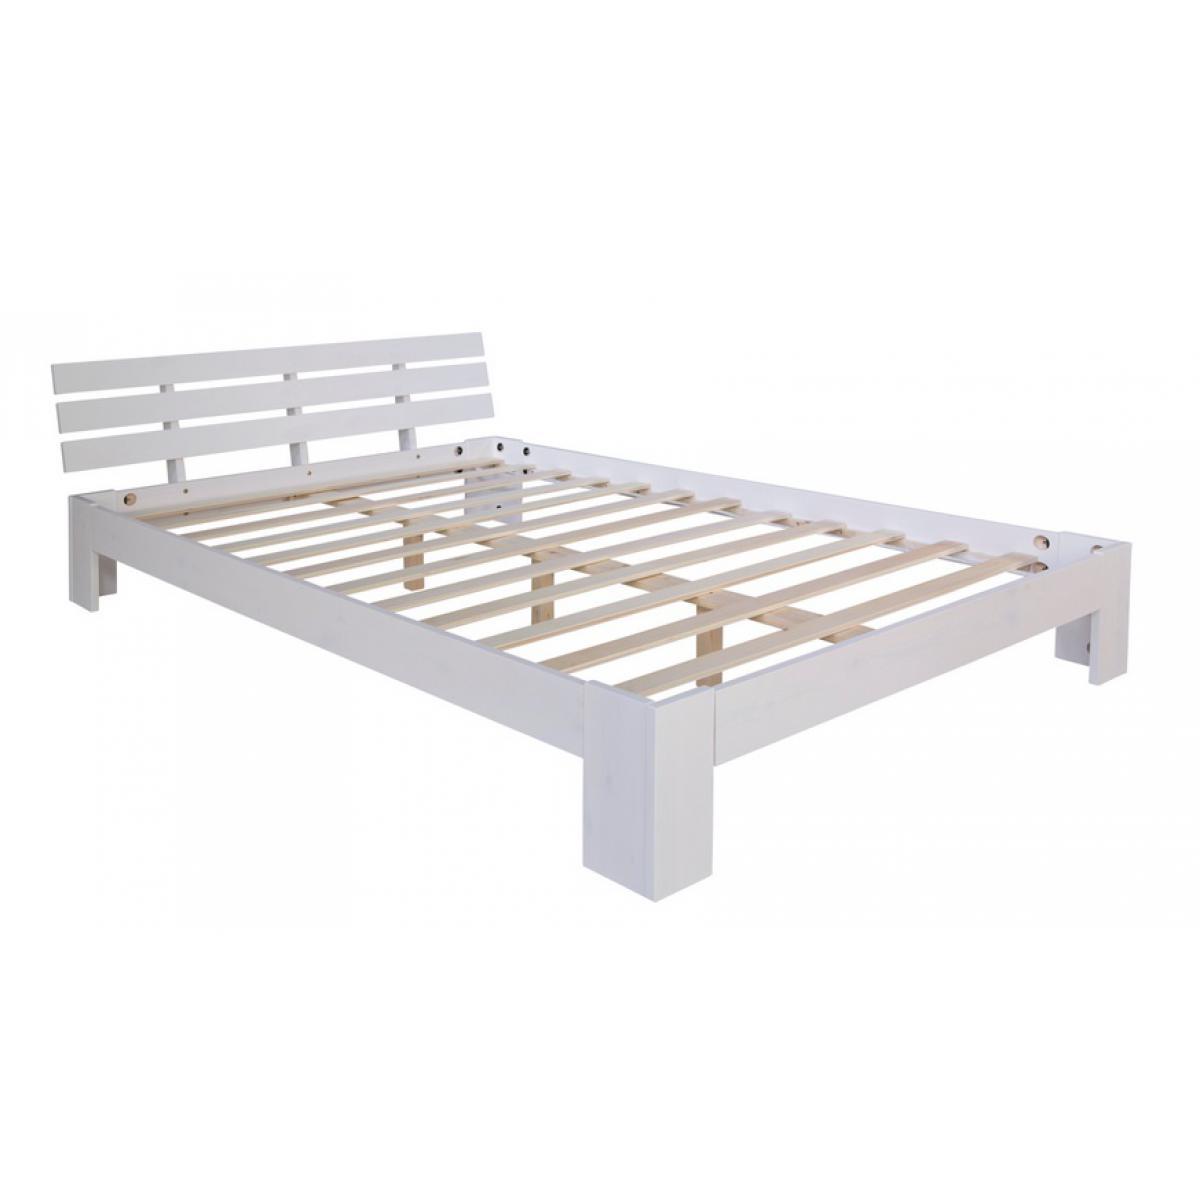 Homestyle4U Futon lit double 140x200 lit en bois blanc